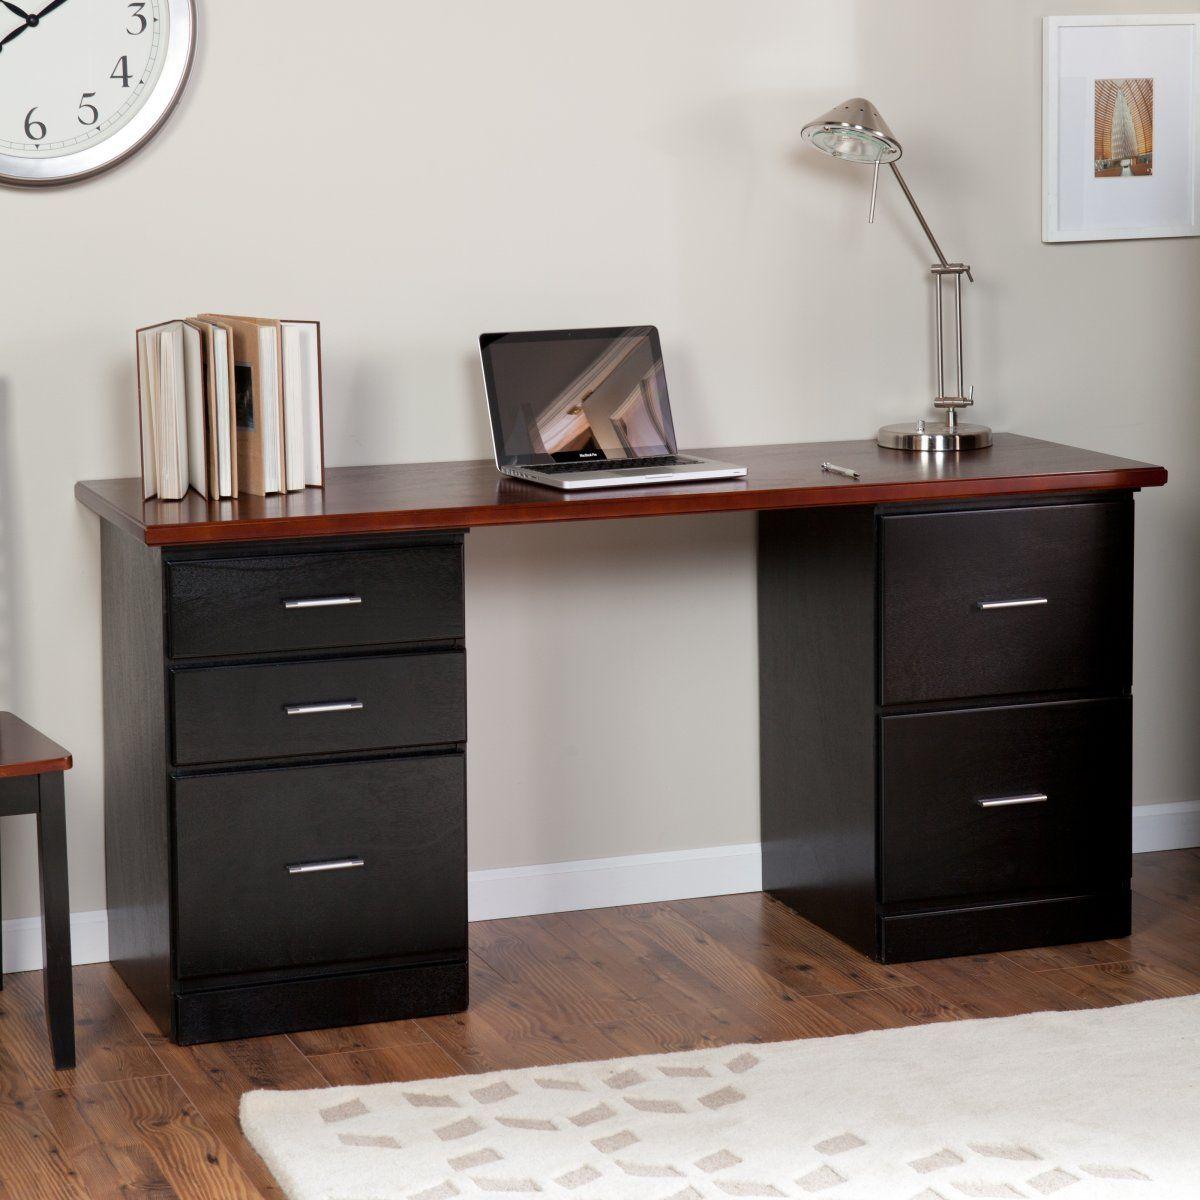 Marvelous Computer Desk With Drawer Designs Inspiration Fascinating Dark Brown Top Black Computer Desk Wit Desk With Drawers Modern Desk Guest Bedroom Office